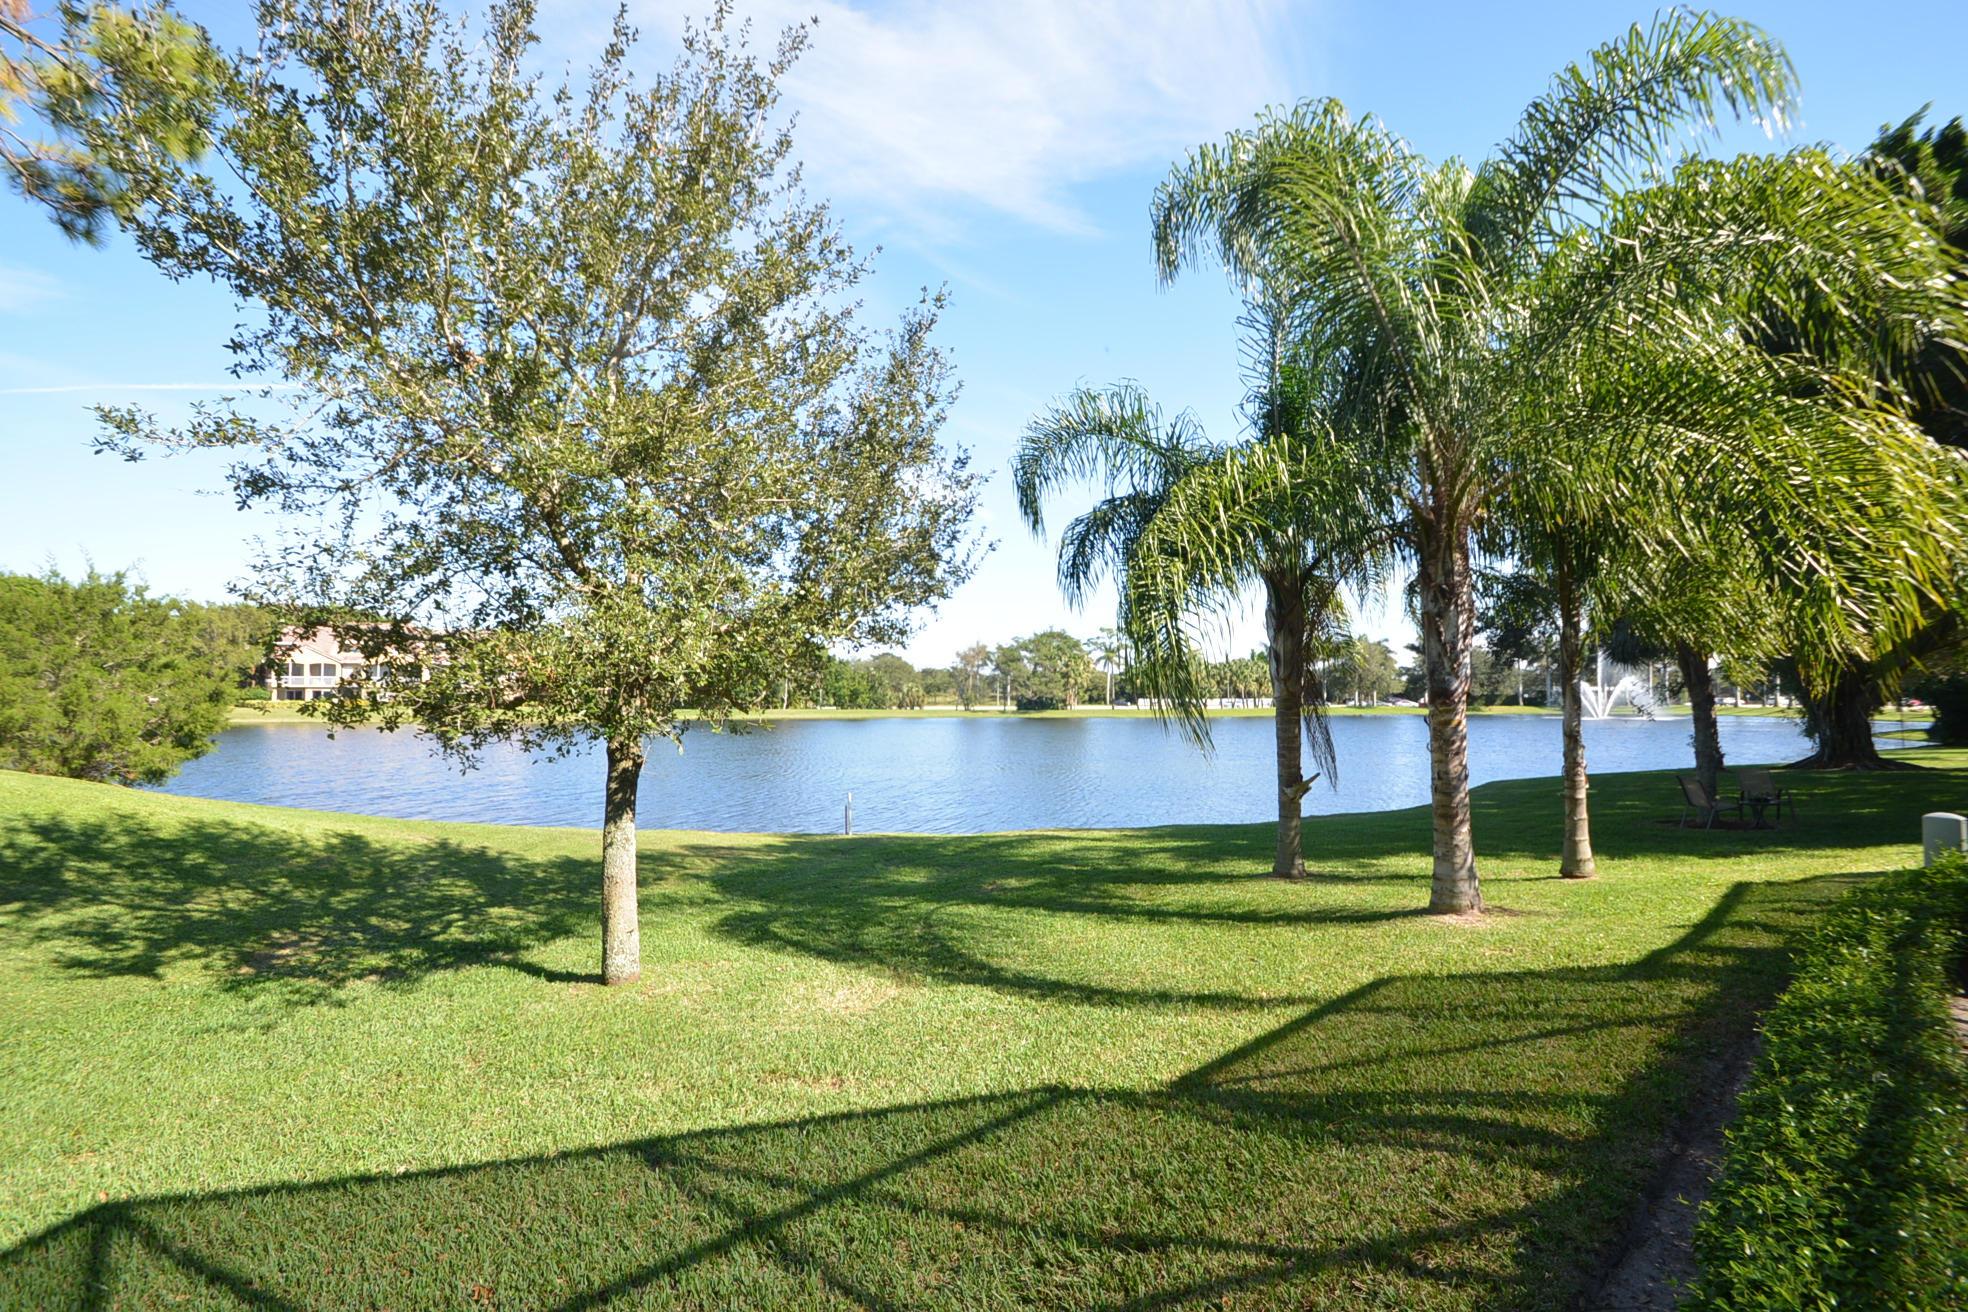 2017 NW 53RD STREET, BOCA RATON, FL 33496